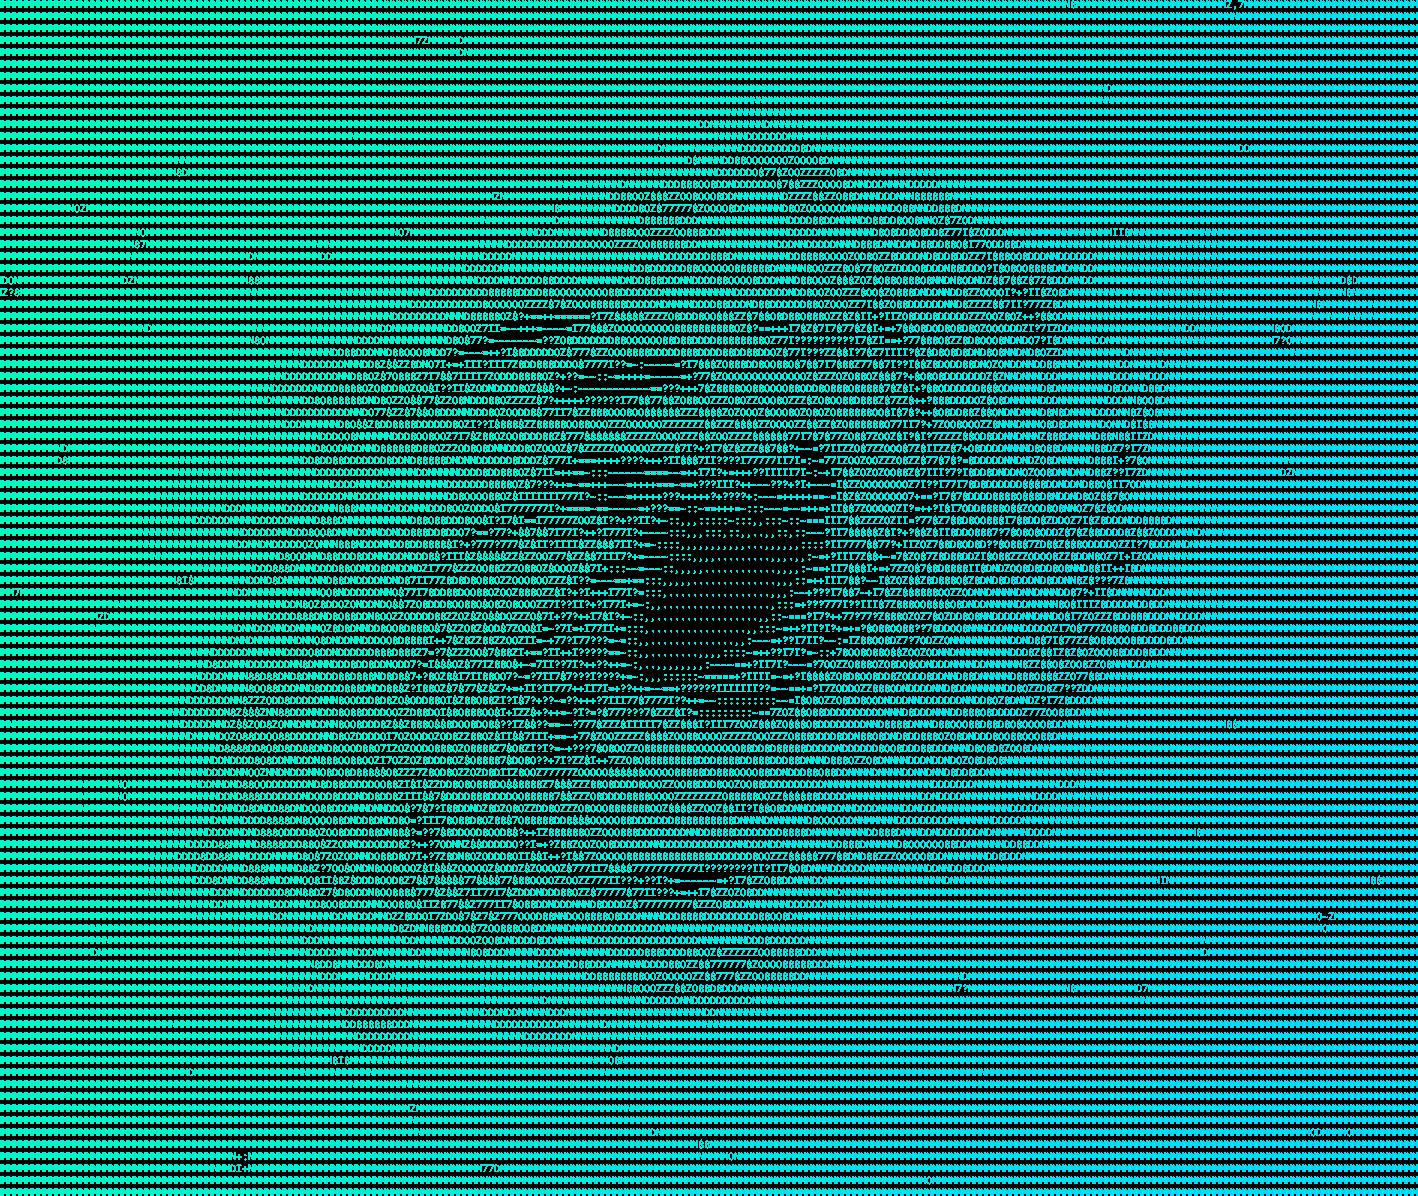 Approaching singularity